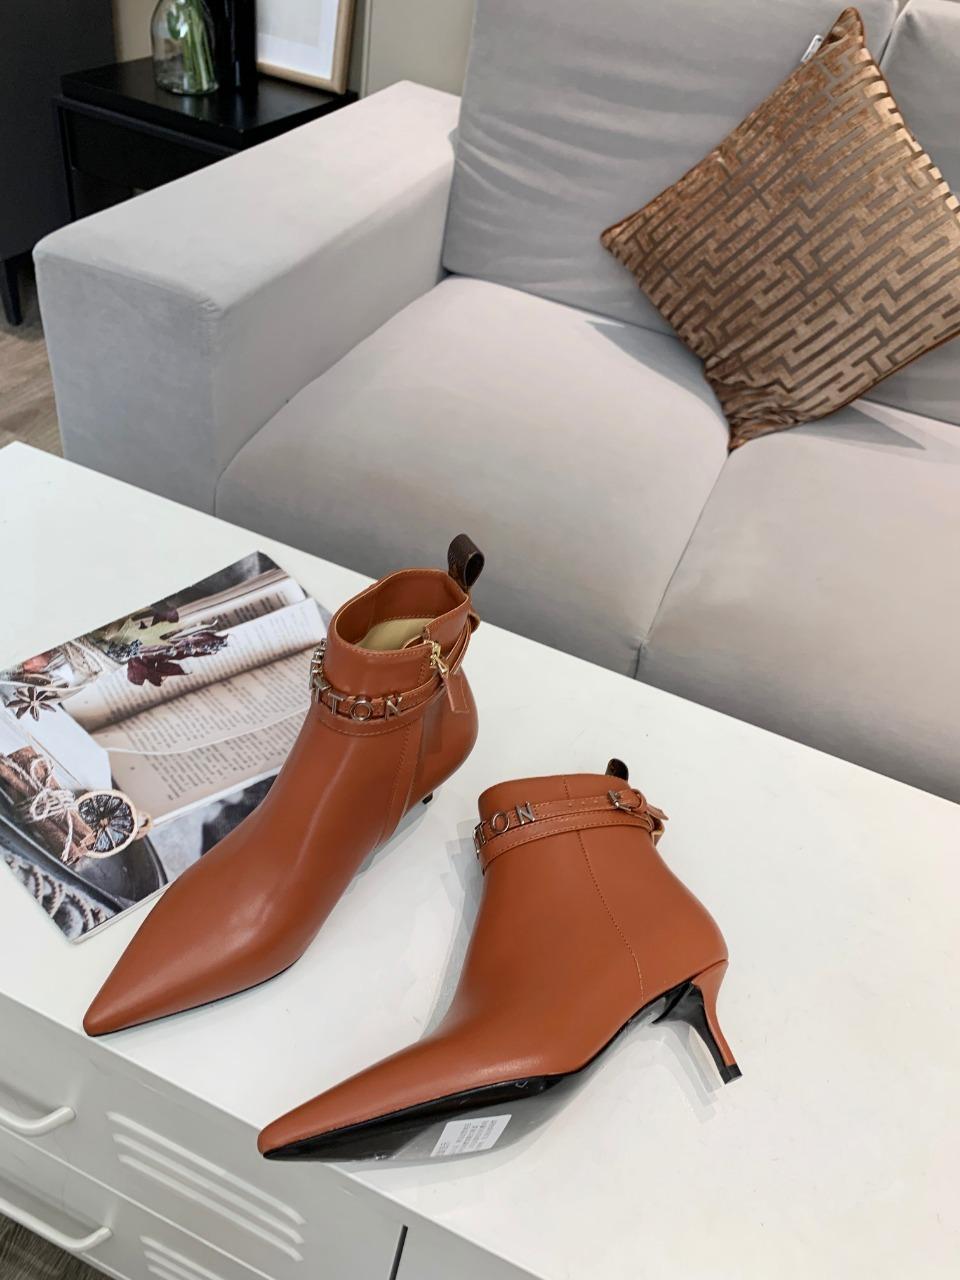 lv秋冬最新系列短靴一系列版面全部做